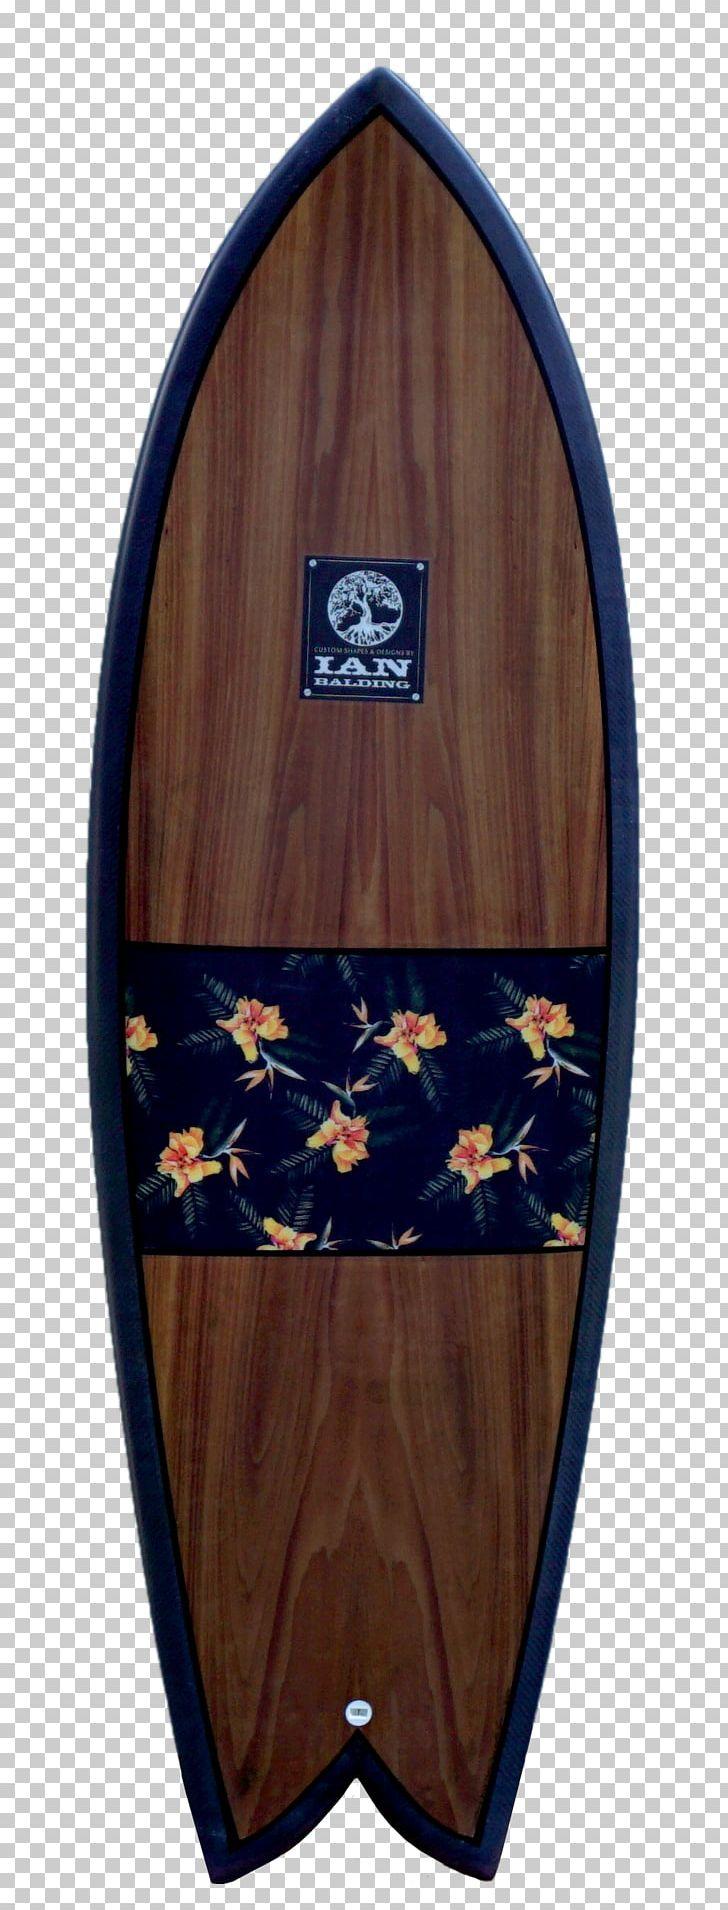 Surfboard Fins Longboard Shortboard Standup Paddleboarding PNG, Clipart, Bald, Blog, Boat, Custom, Fin Free PNG Download